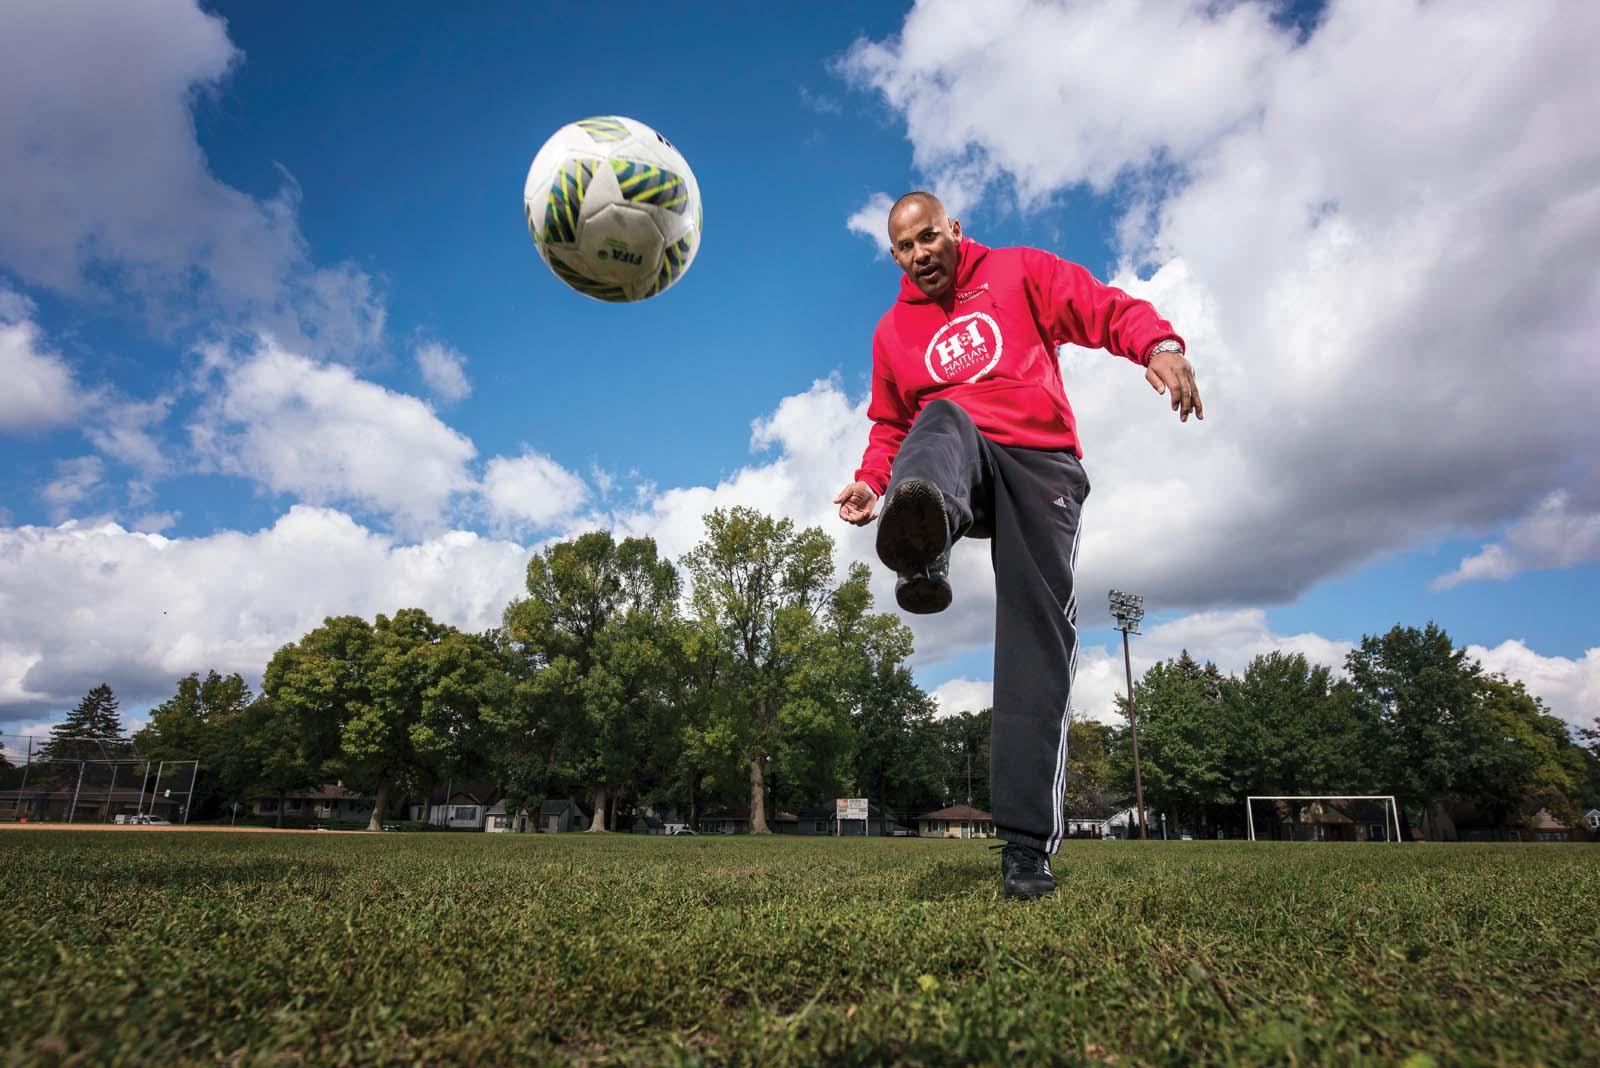 Tony Sanneh kicking a soccer ball.